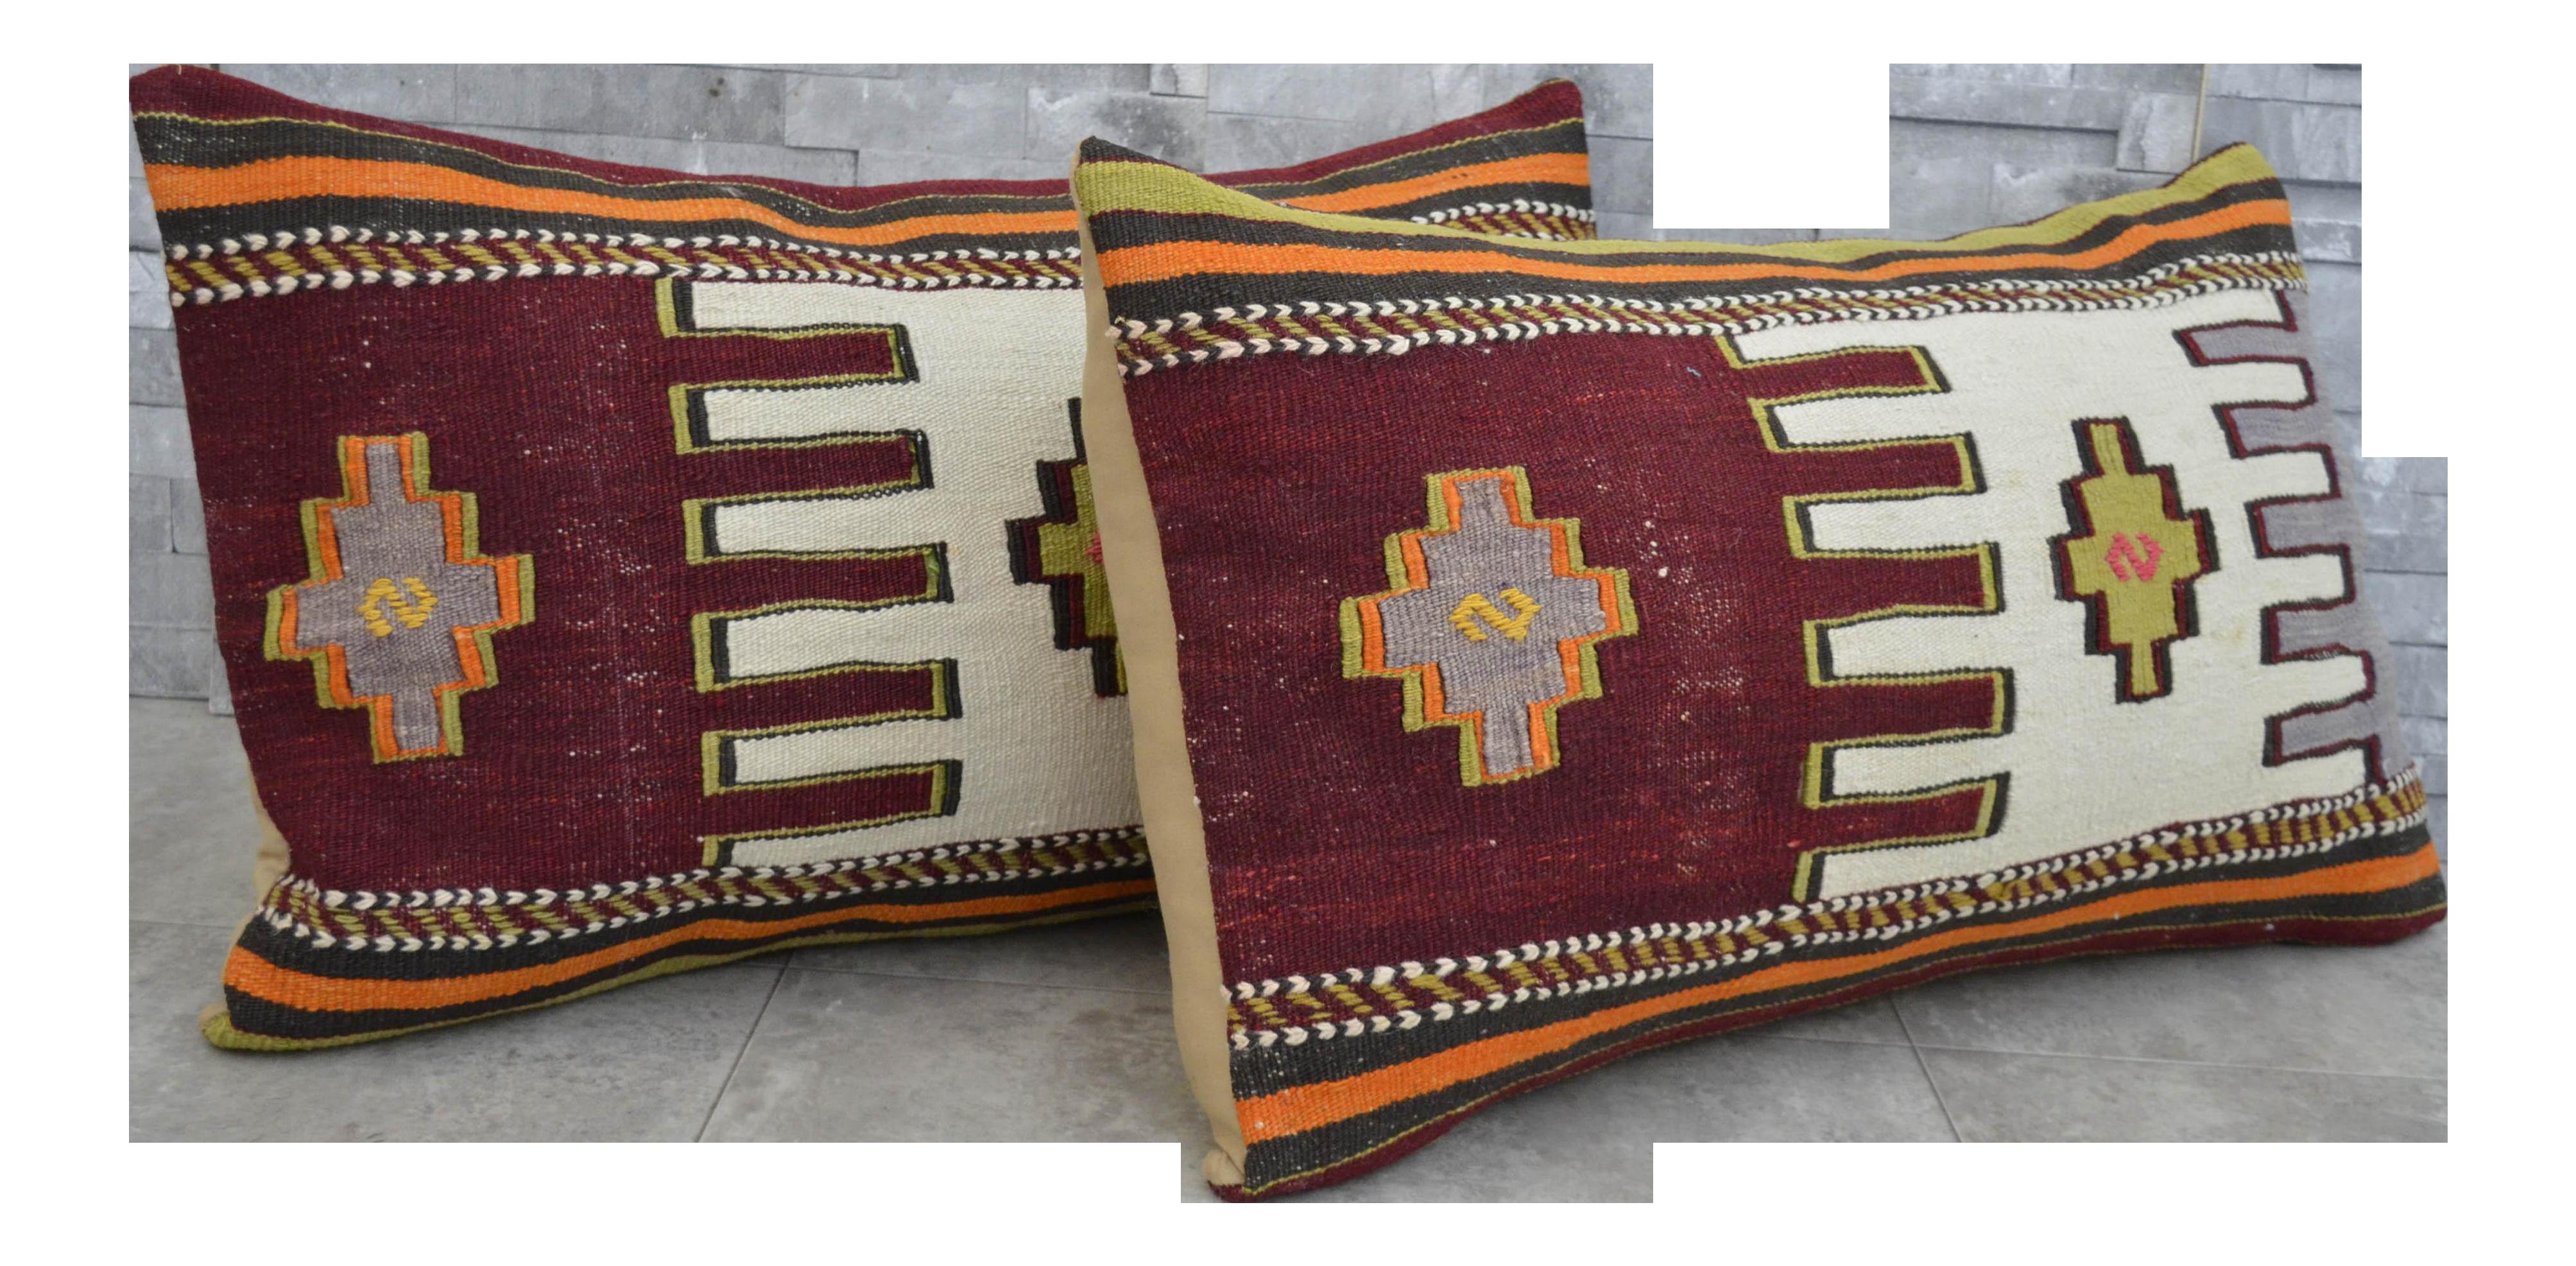 Vintage Turkish Kilim Rug Pillow Covers A Pair Chairish